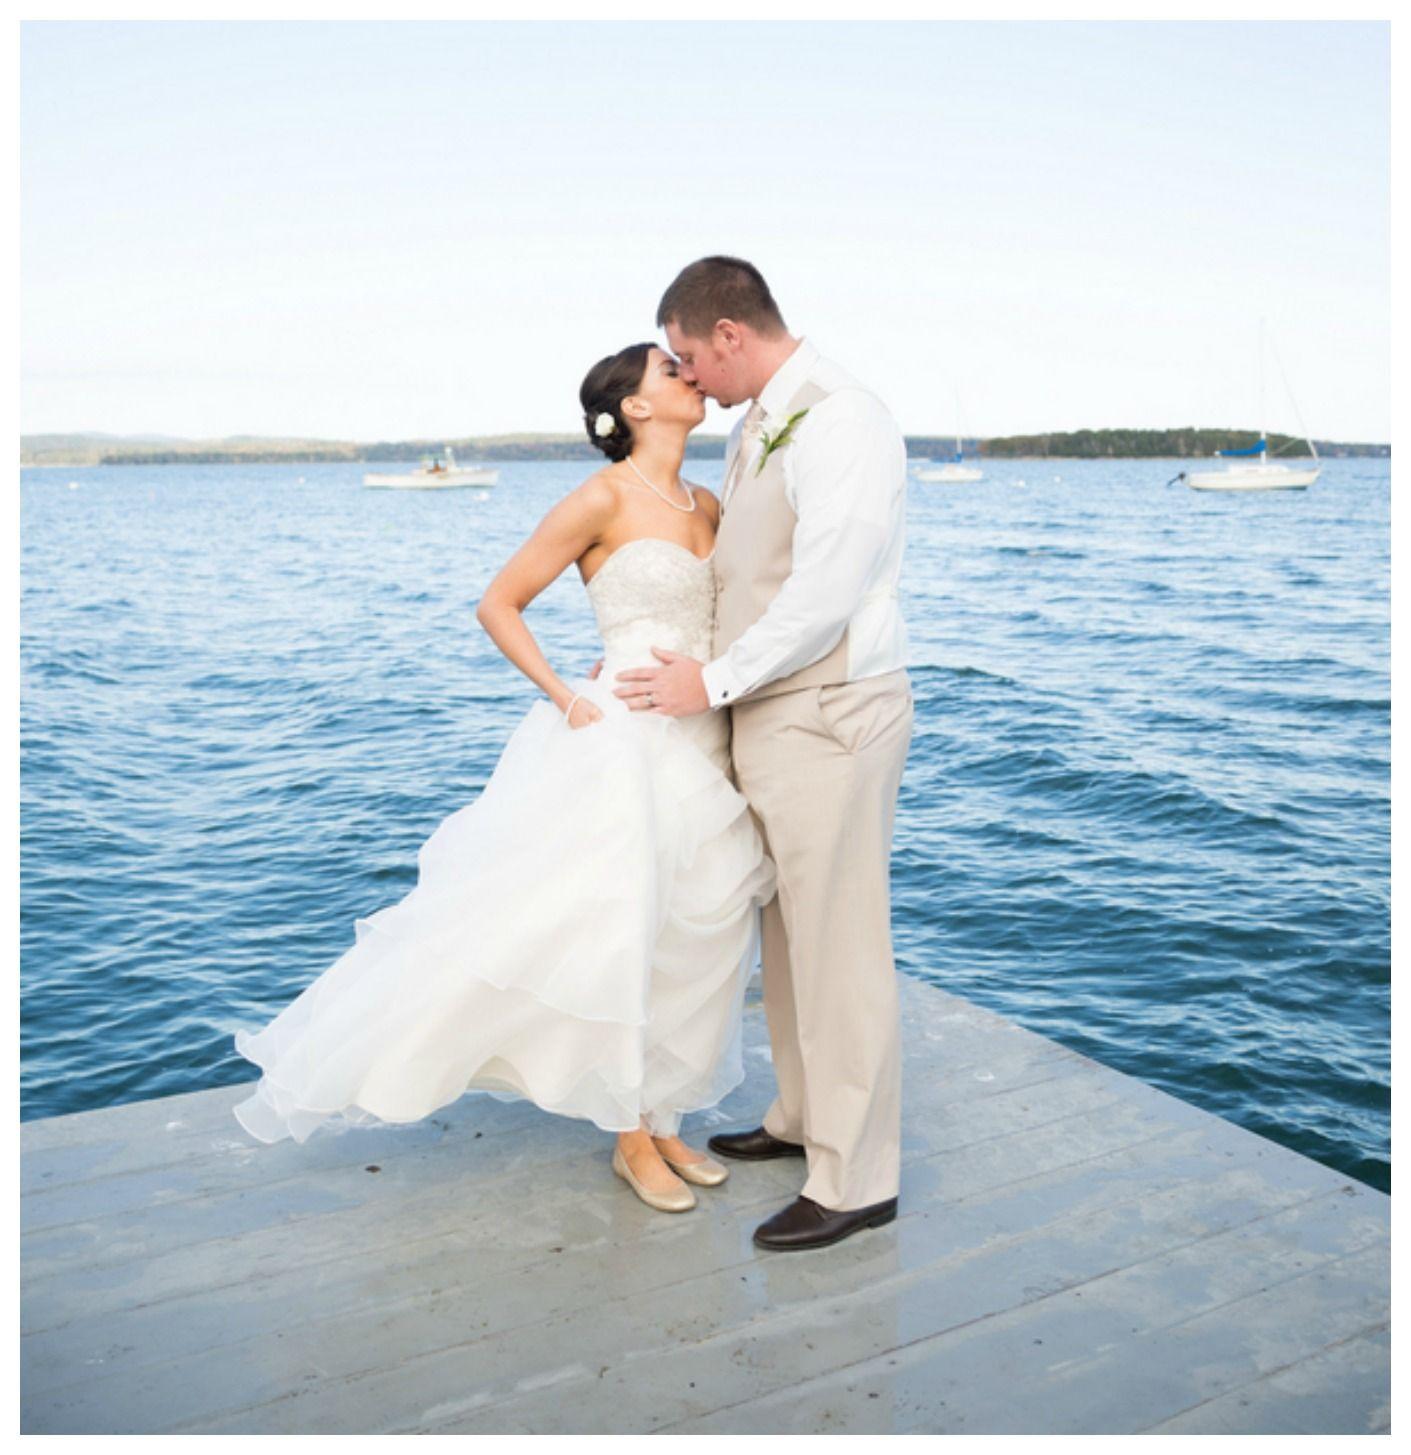 Rustic Maine Coastline Wedding